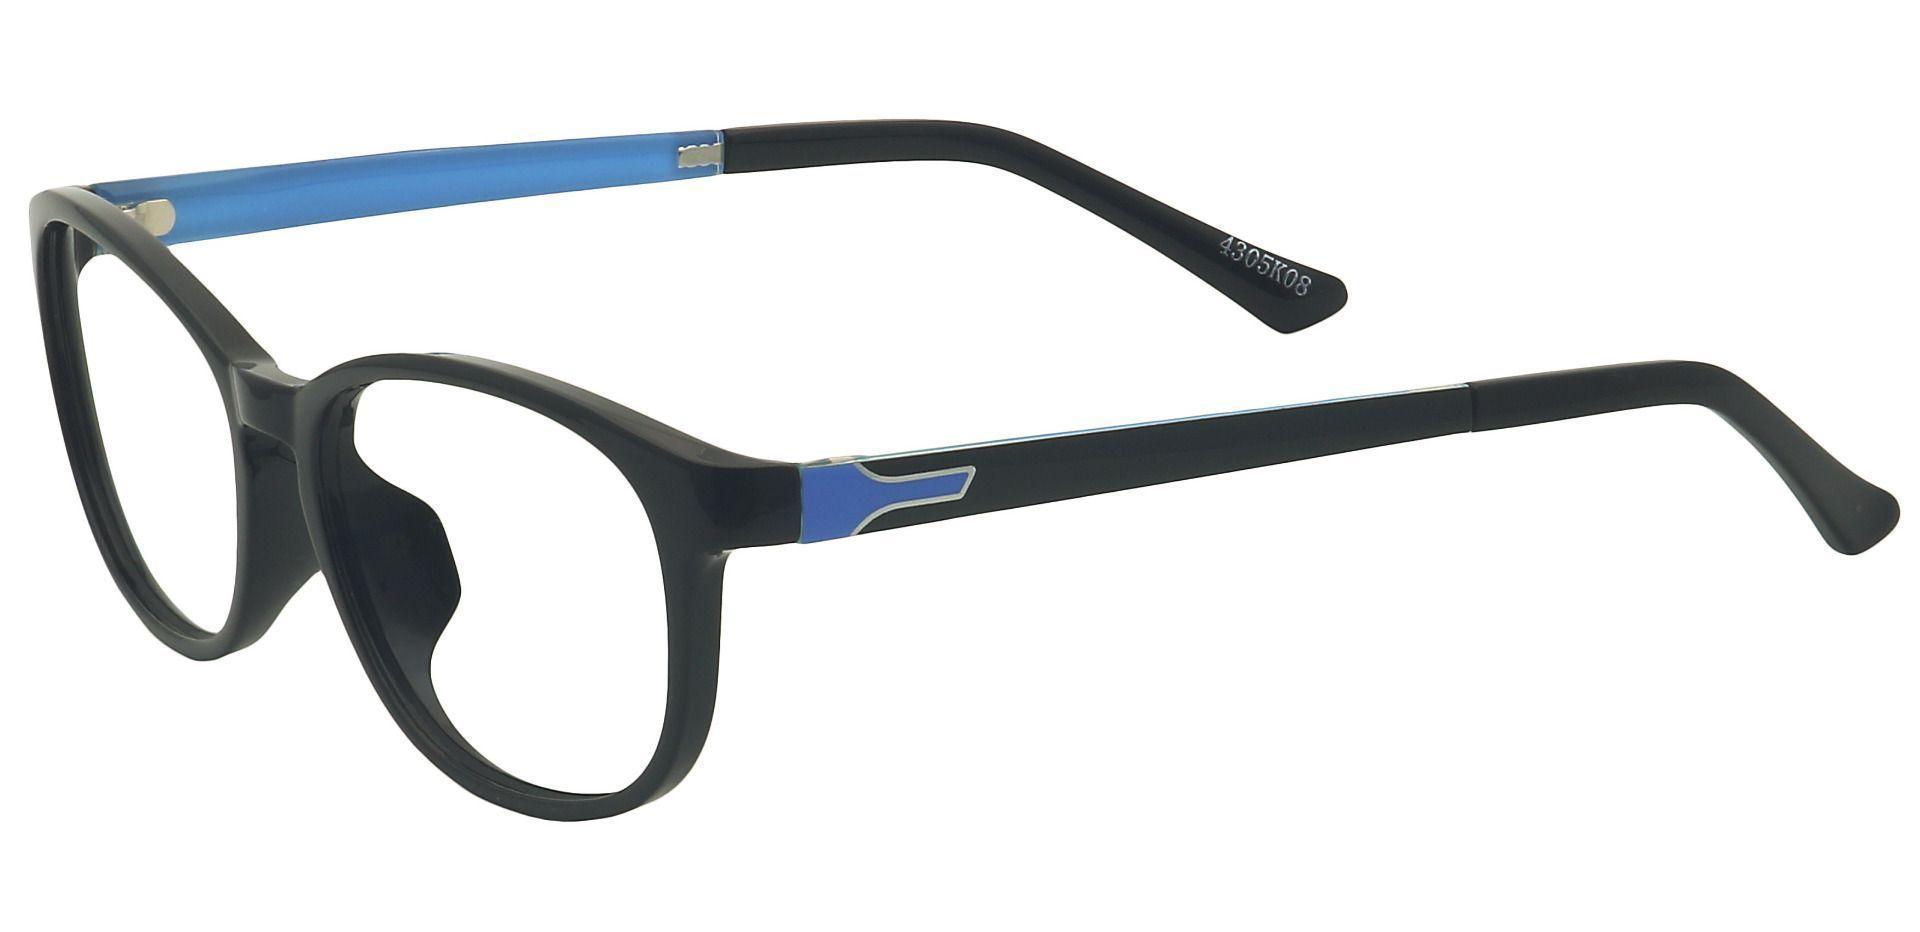 Tigress Oval Prescription Glasses - Black